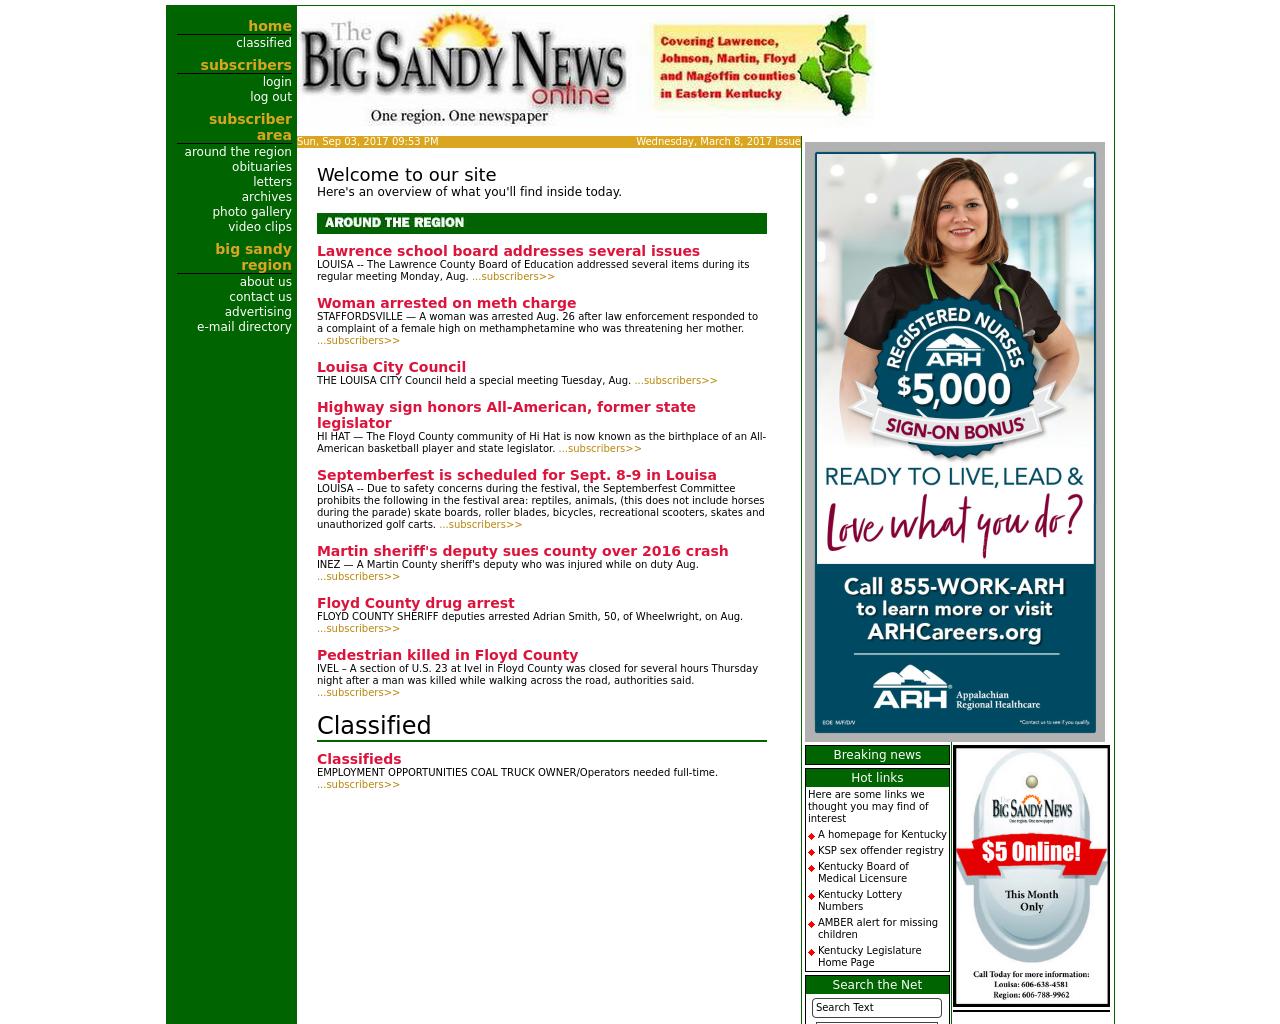 Big-Sandy-News-Advertising-Reviews-Pricing